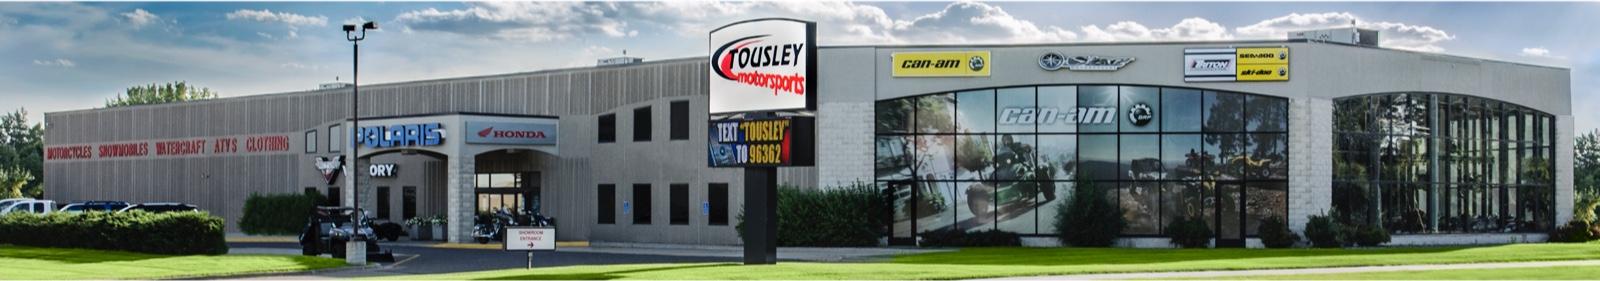 Exterior of Tousley Motorsports White Bear Lake, MN